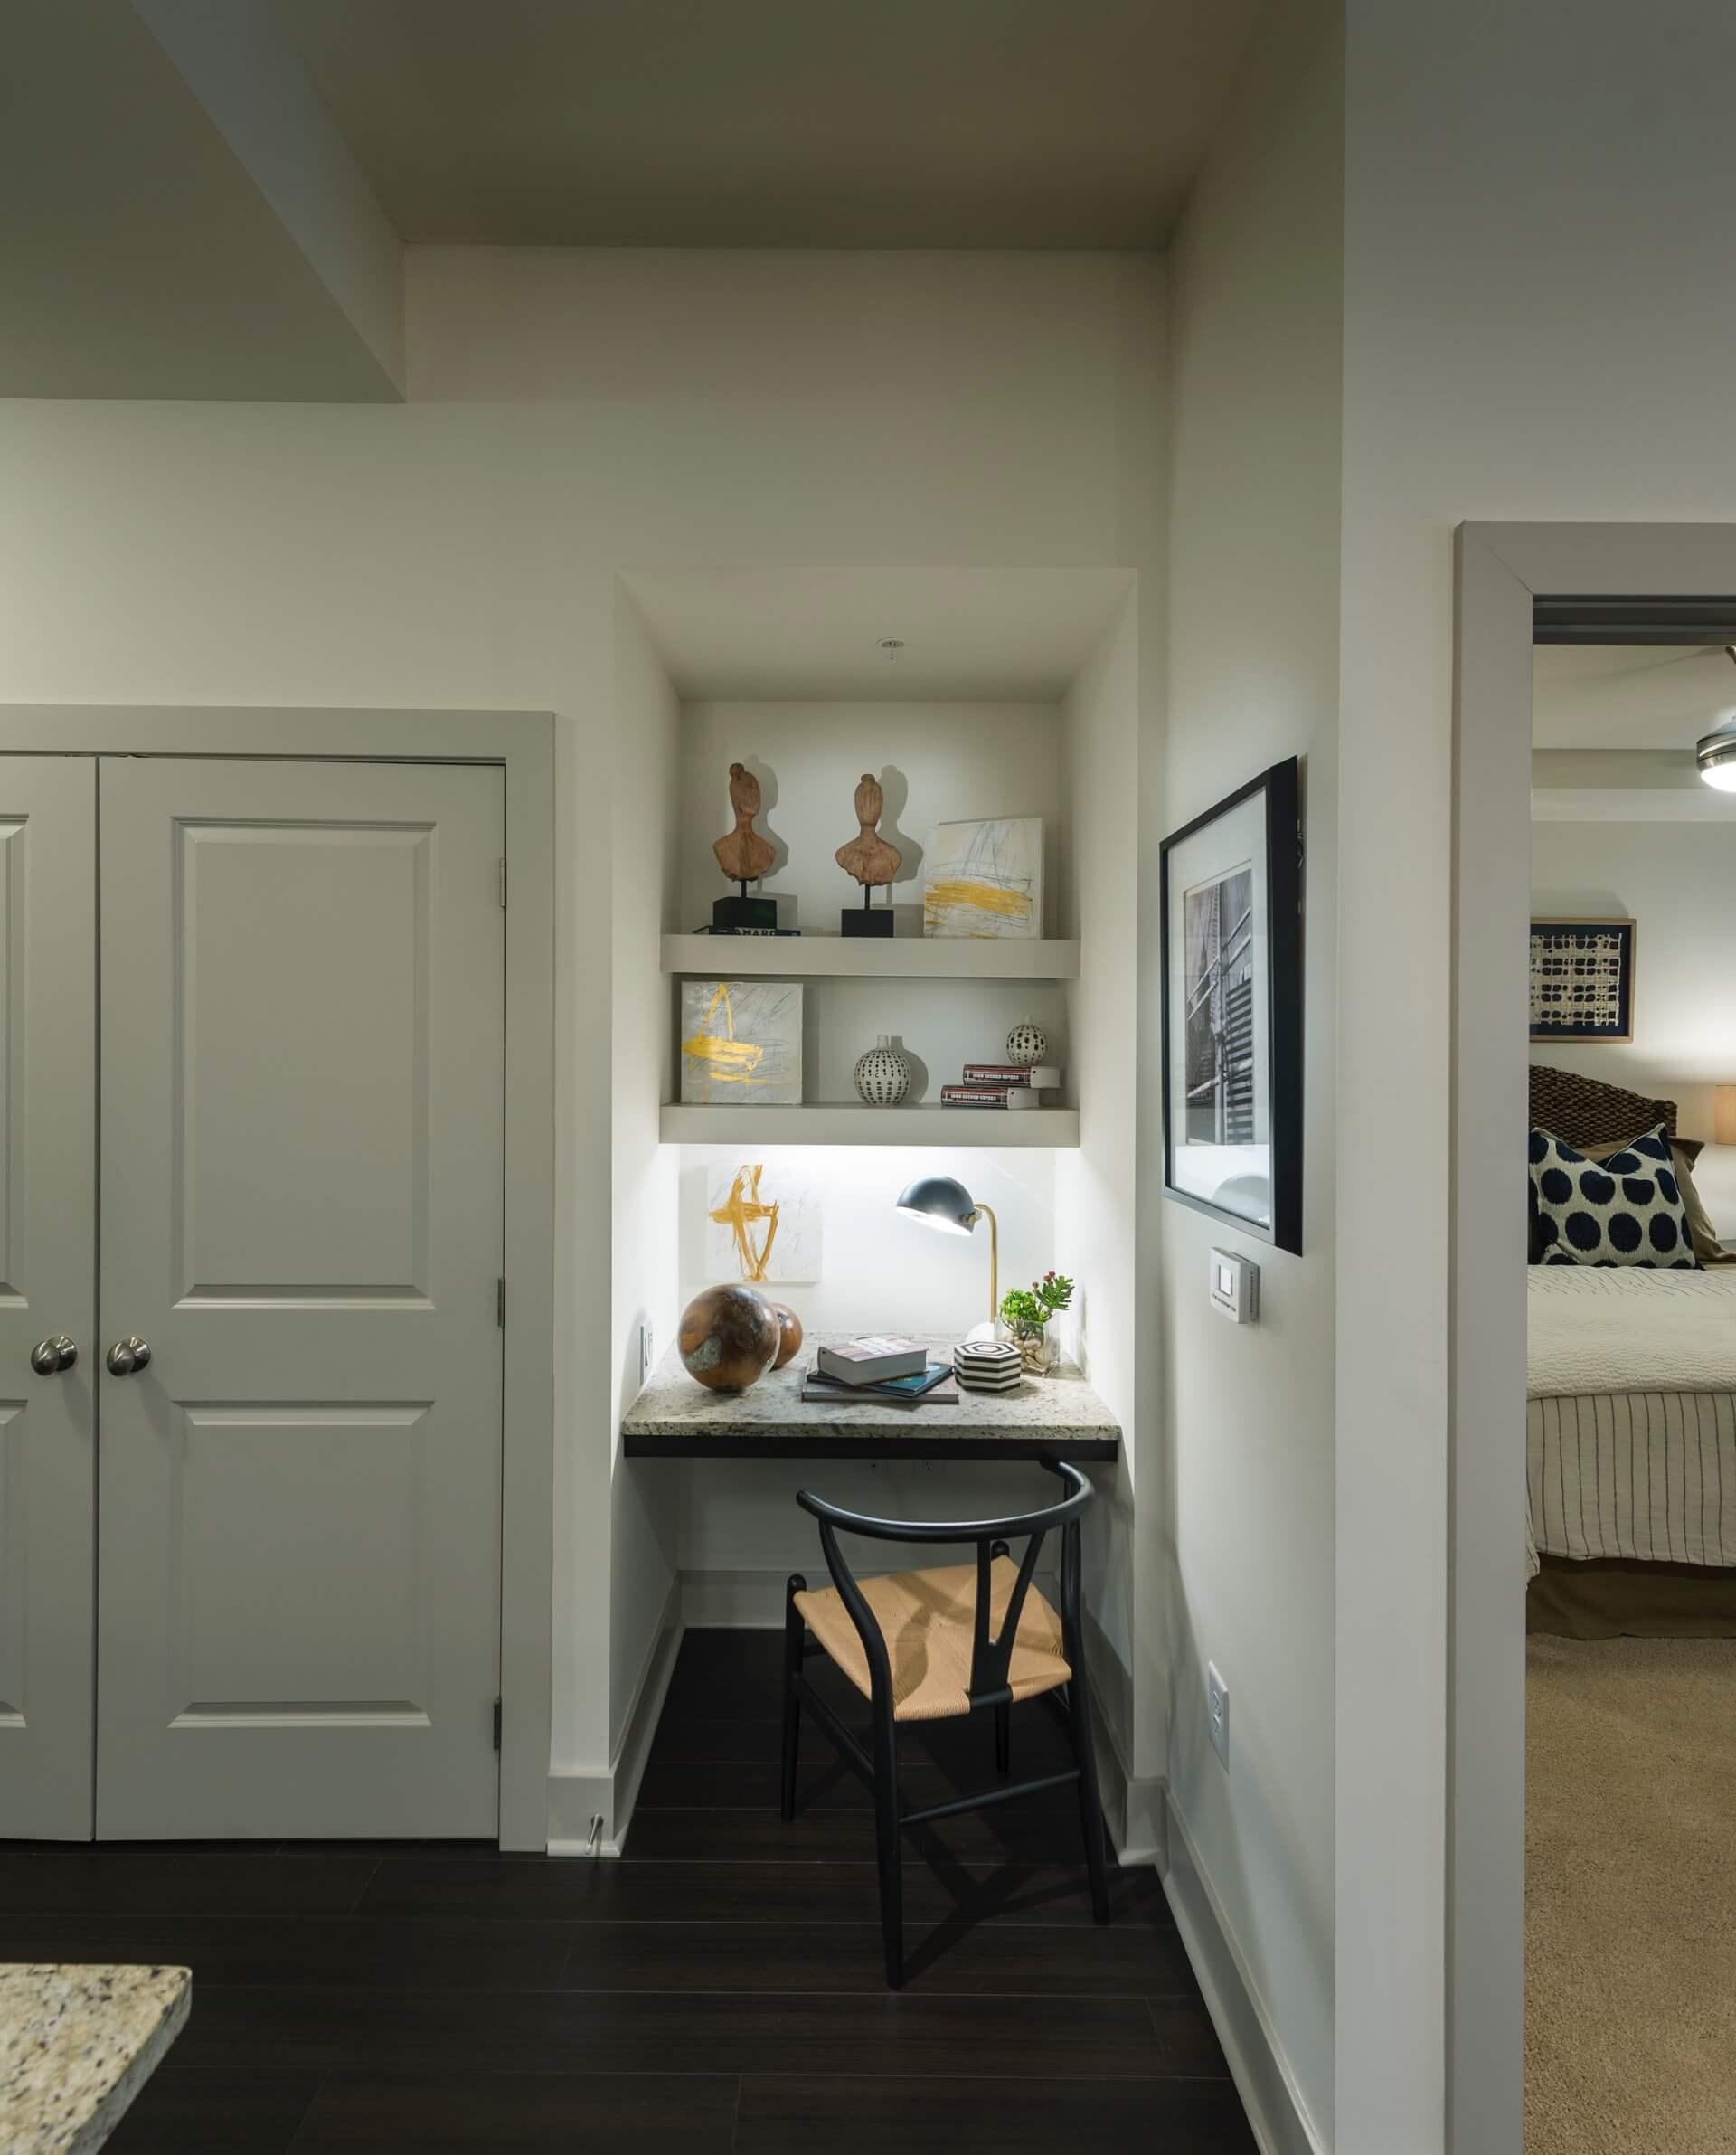 Built-in shelves in select homes